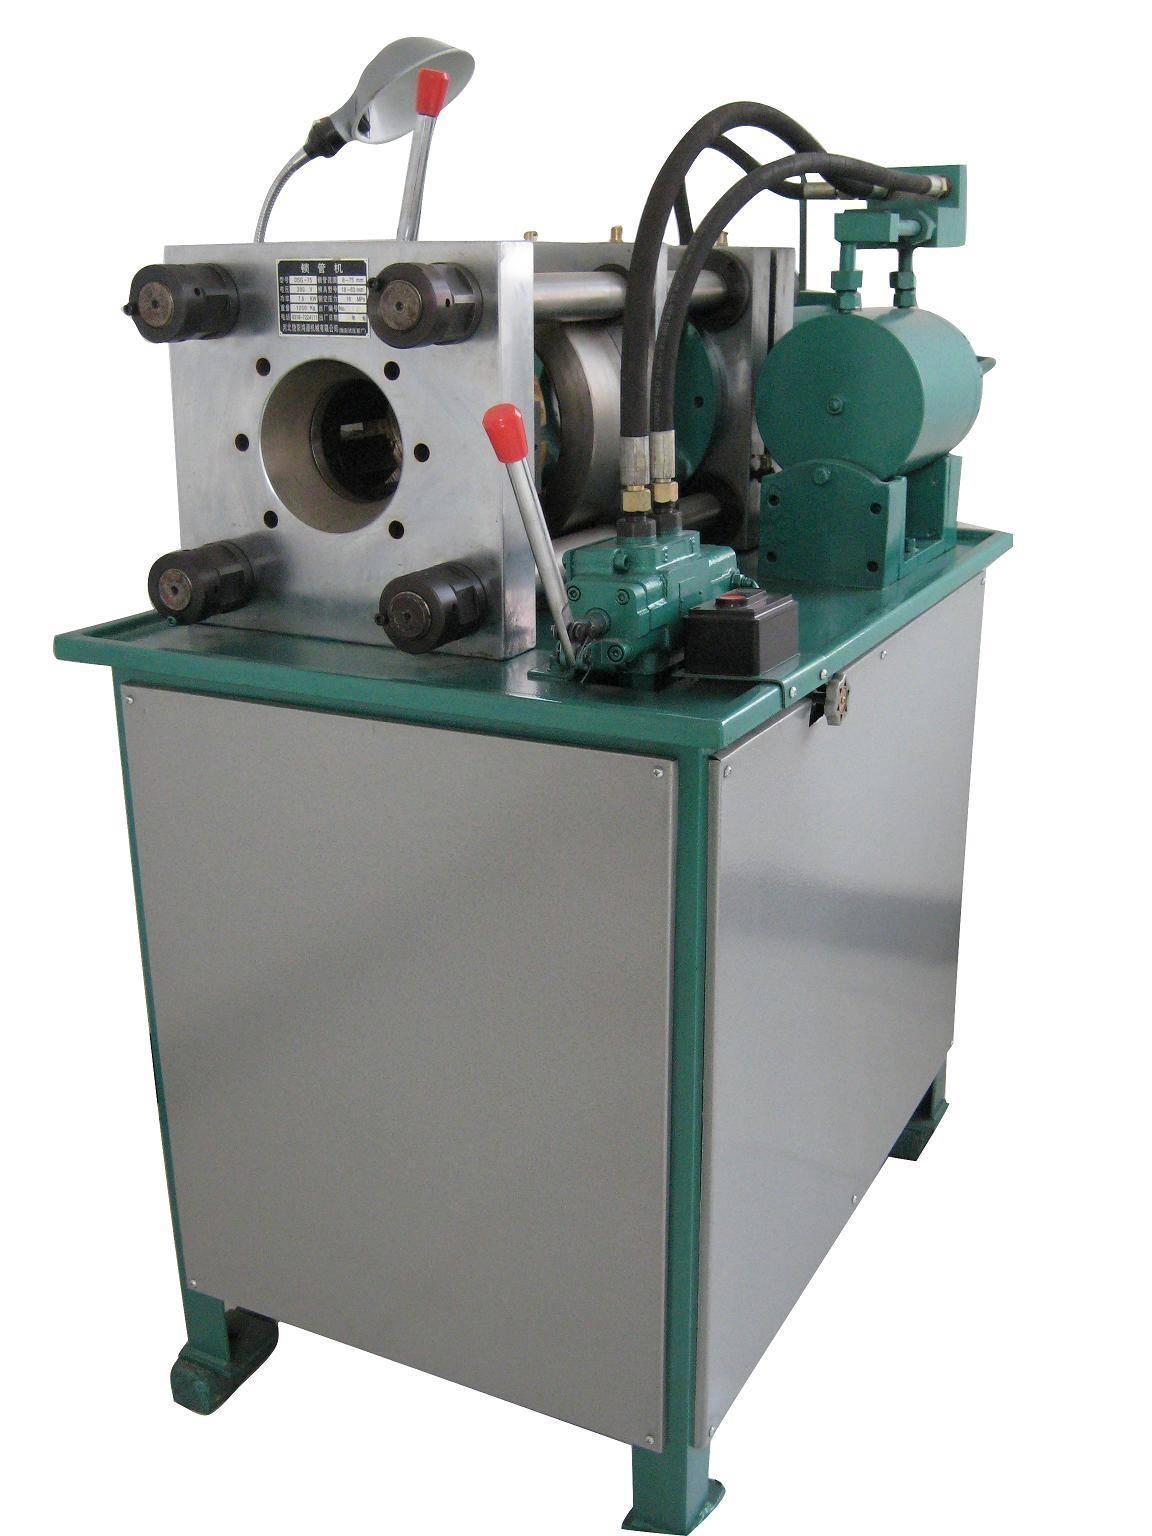 DSG-102 High Pressure Pipe Locking Machine